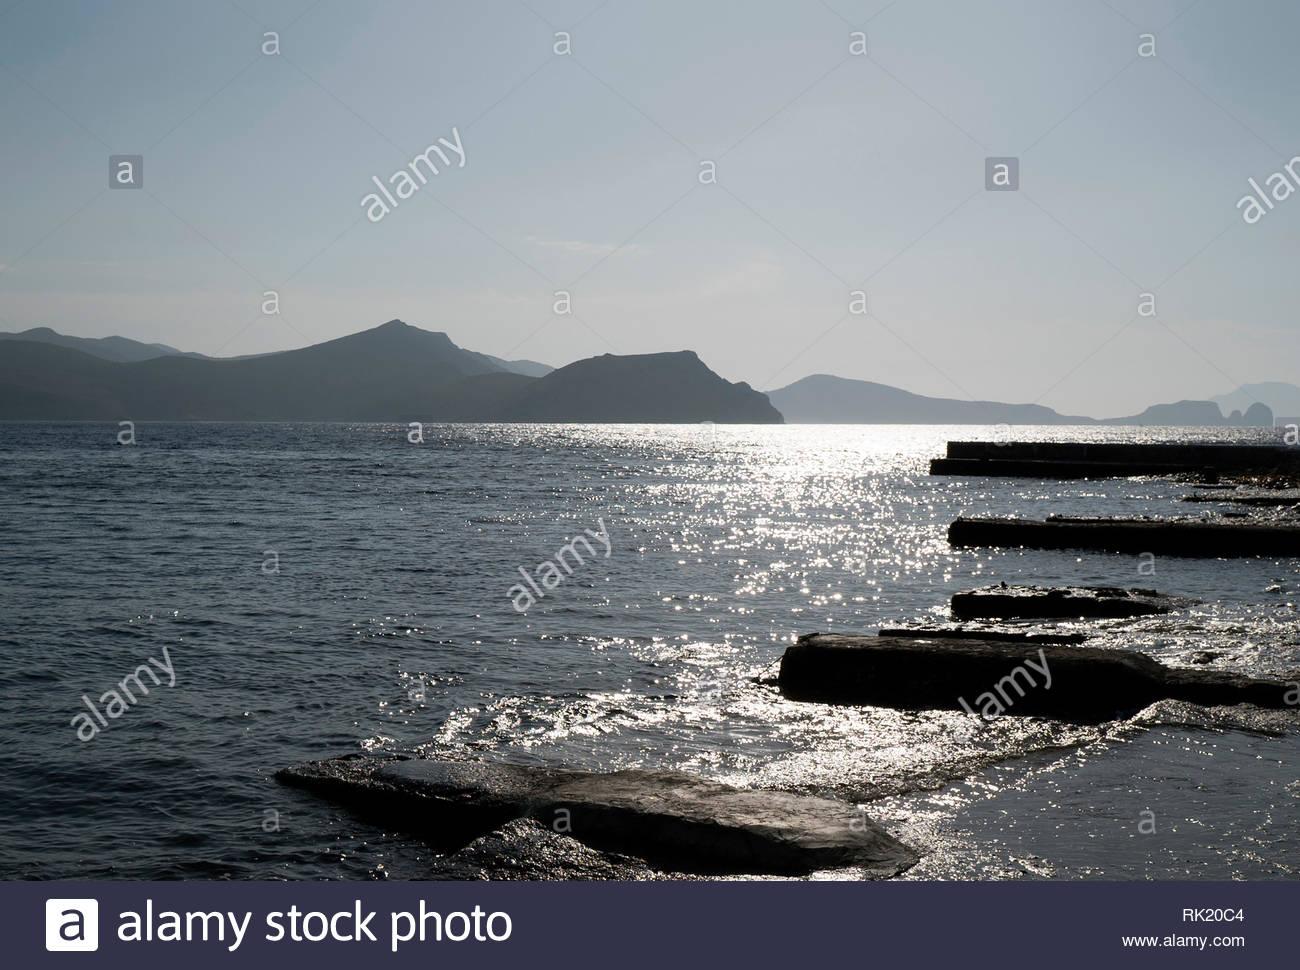 View Across The Sea From Klima, Milos, Greece - Stock Image